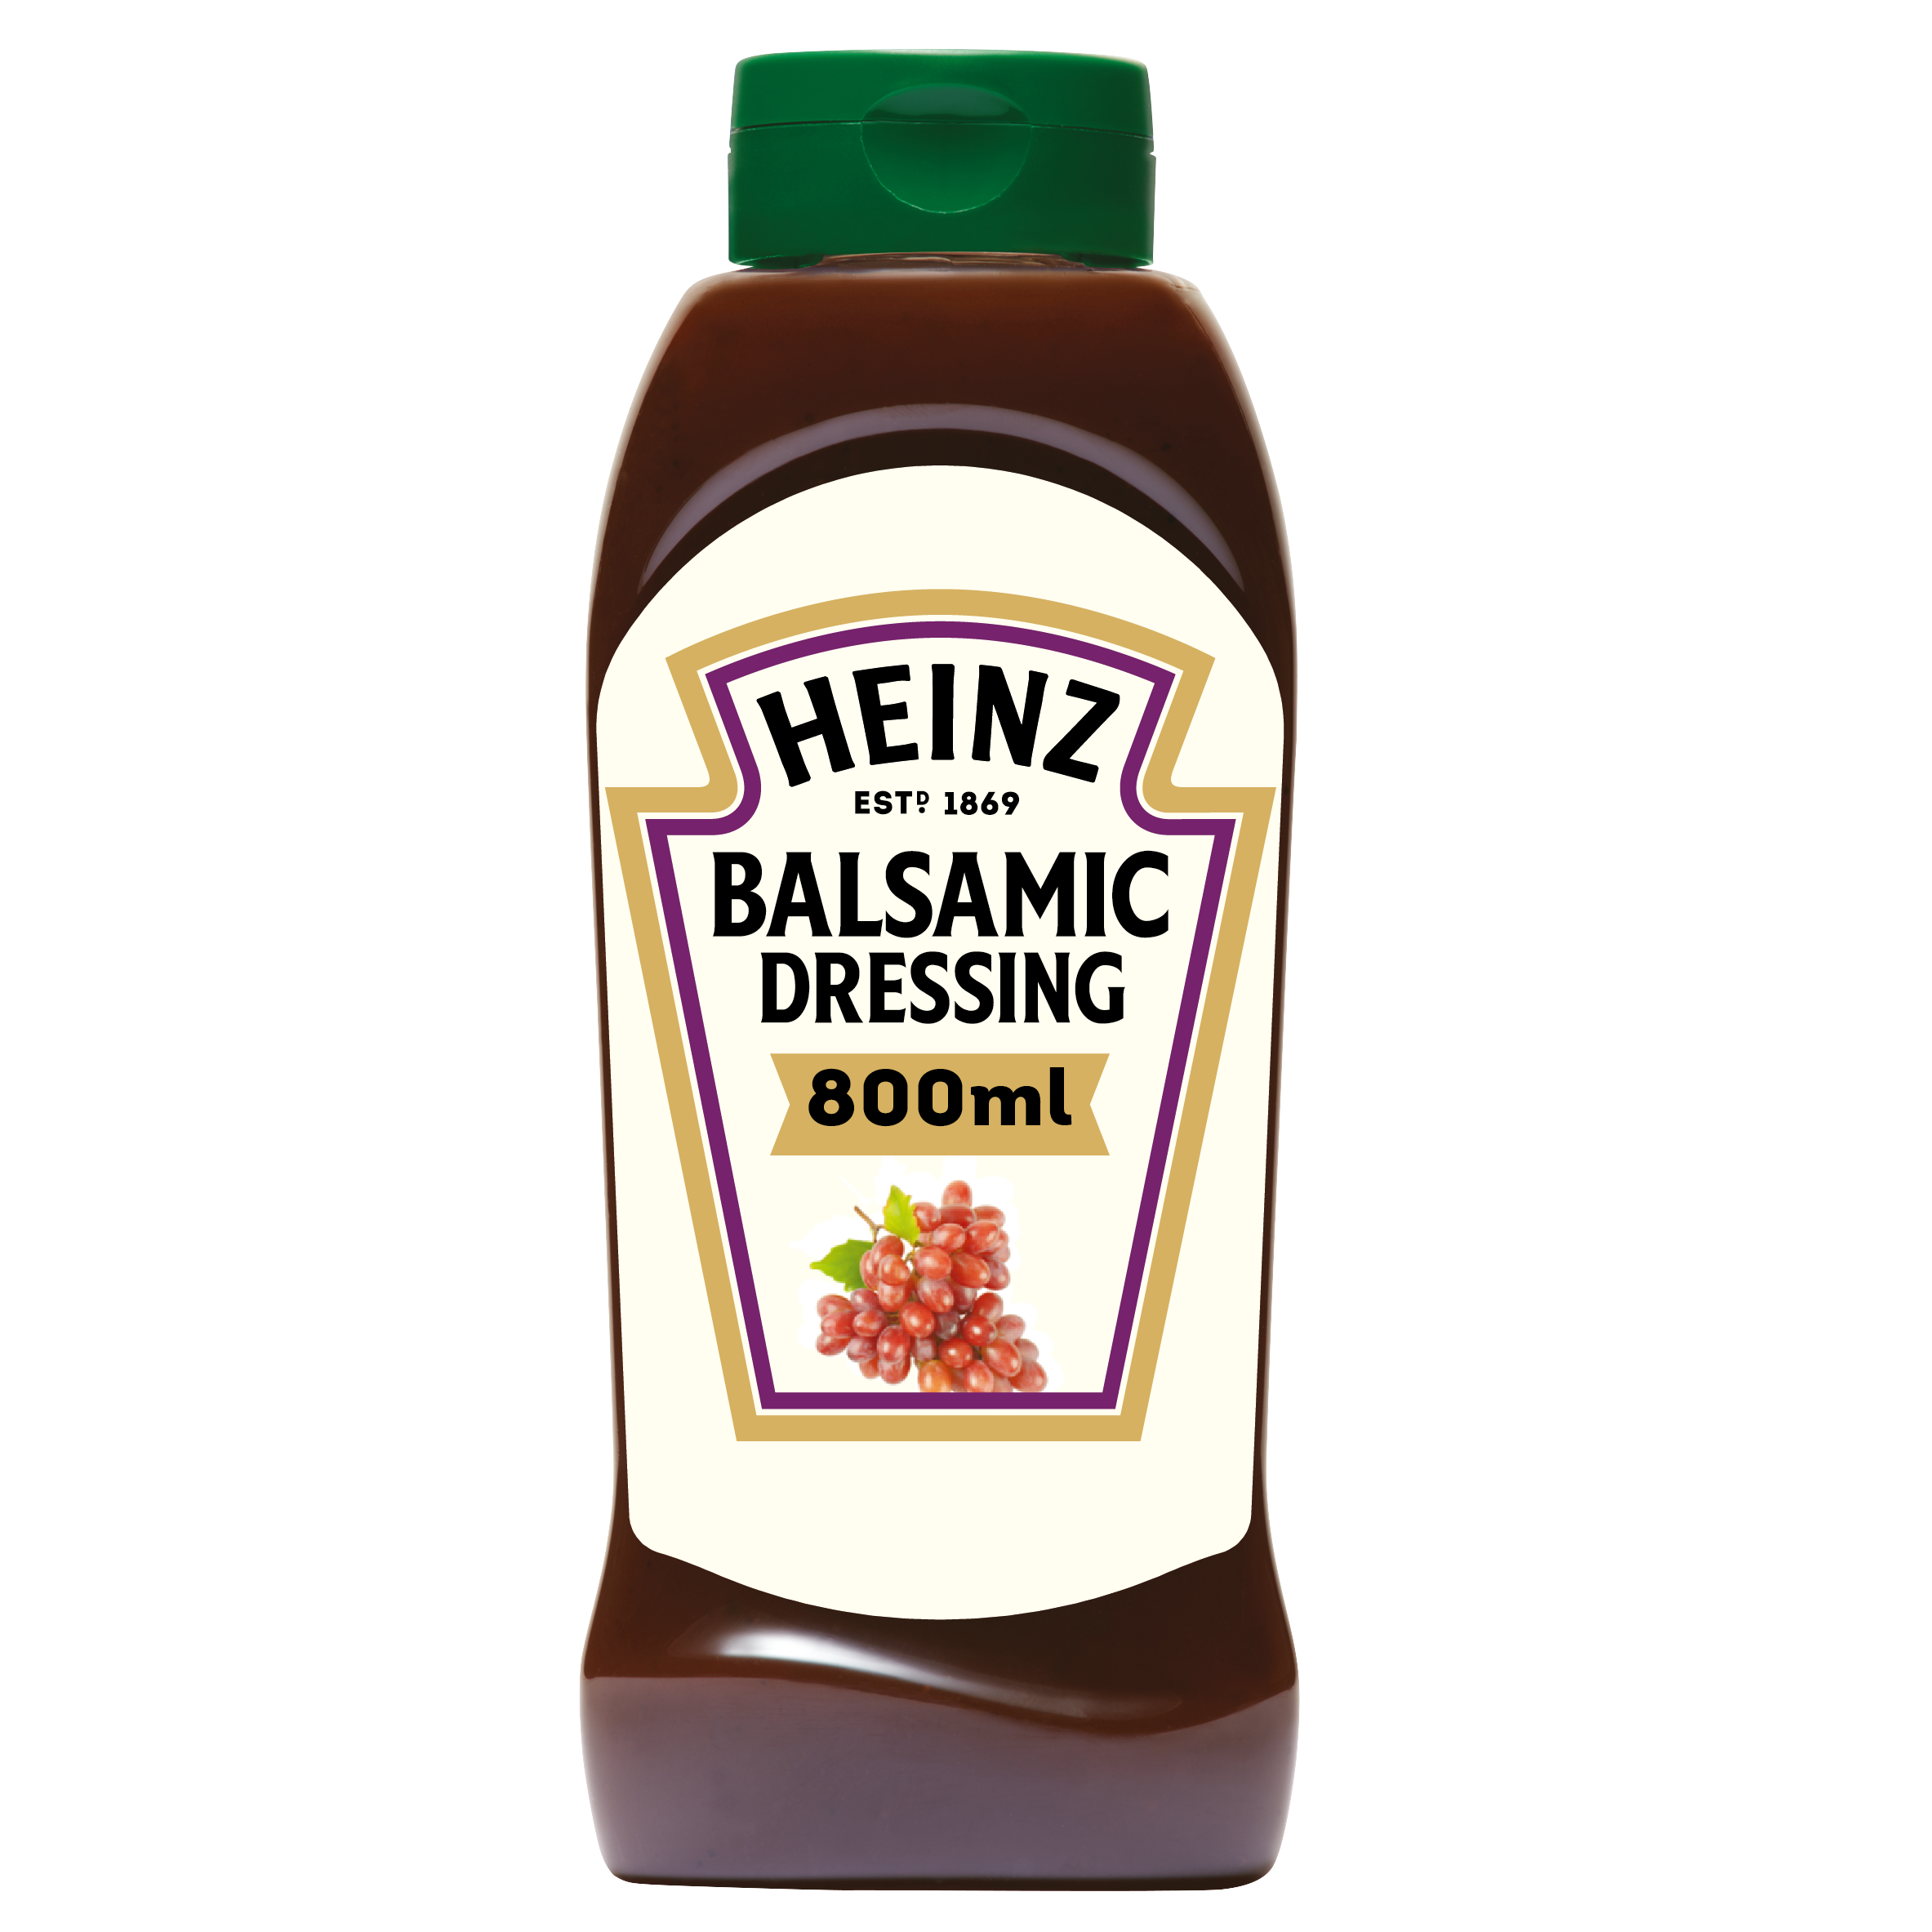 Heinz Balsamic 800ml Bottom Up image